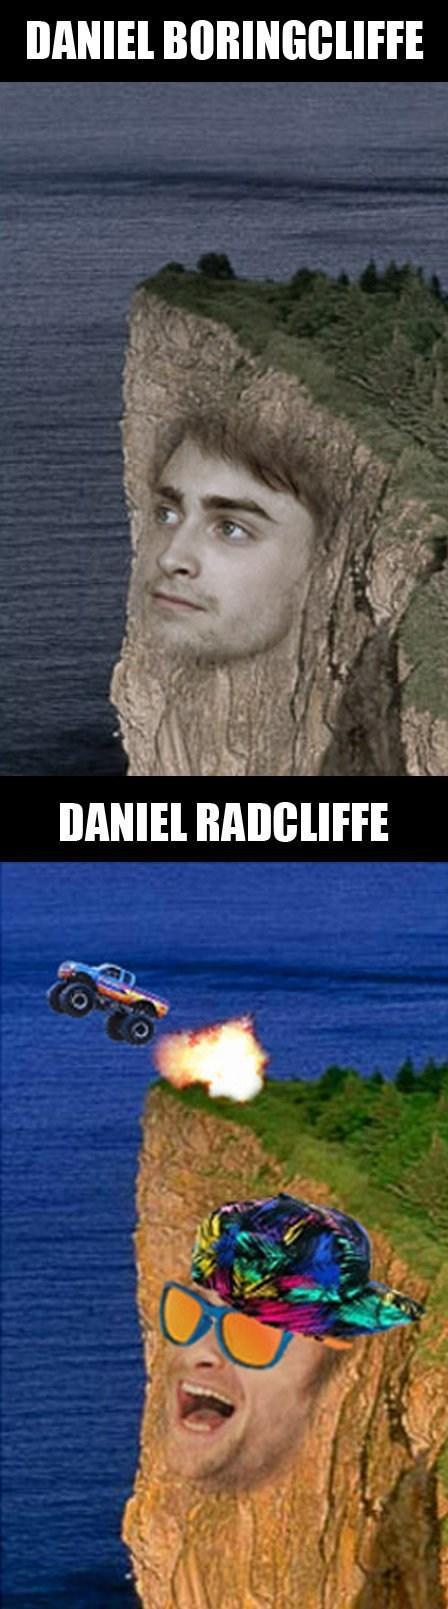 boring Daniel Radcliffe - 7431191296